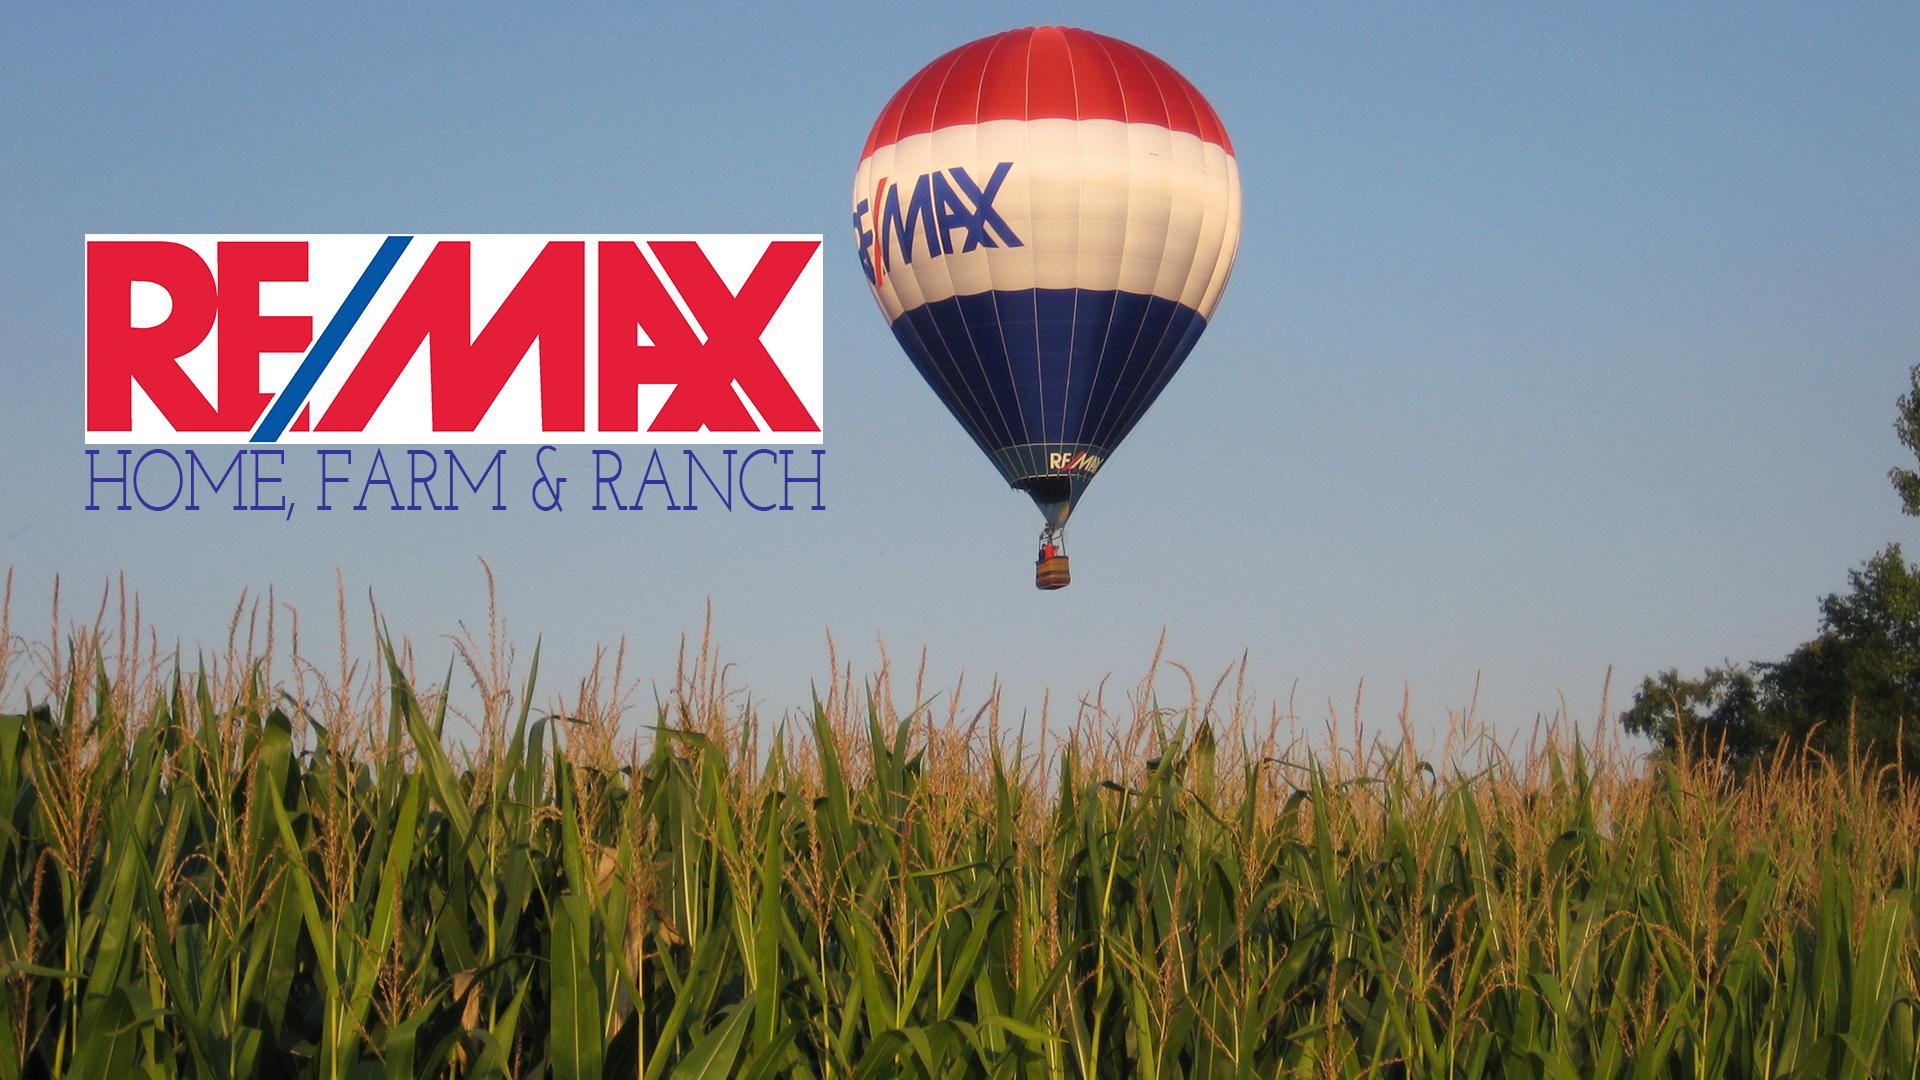 RE/MAX Home, Farm & Ranch image 0